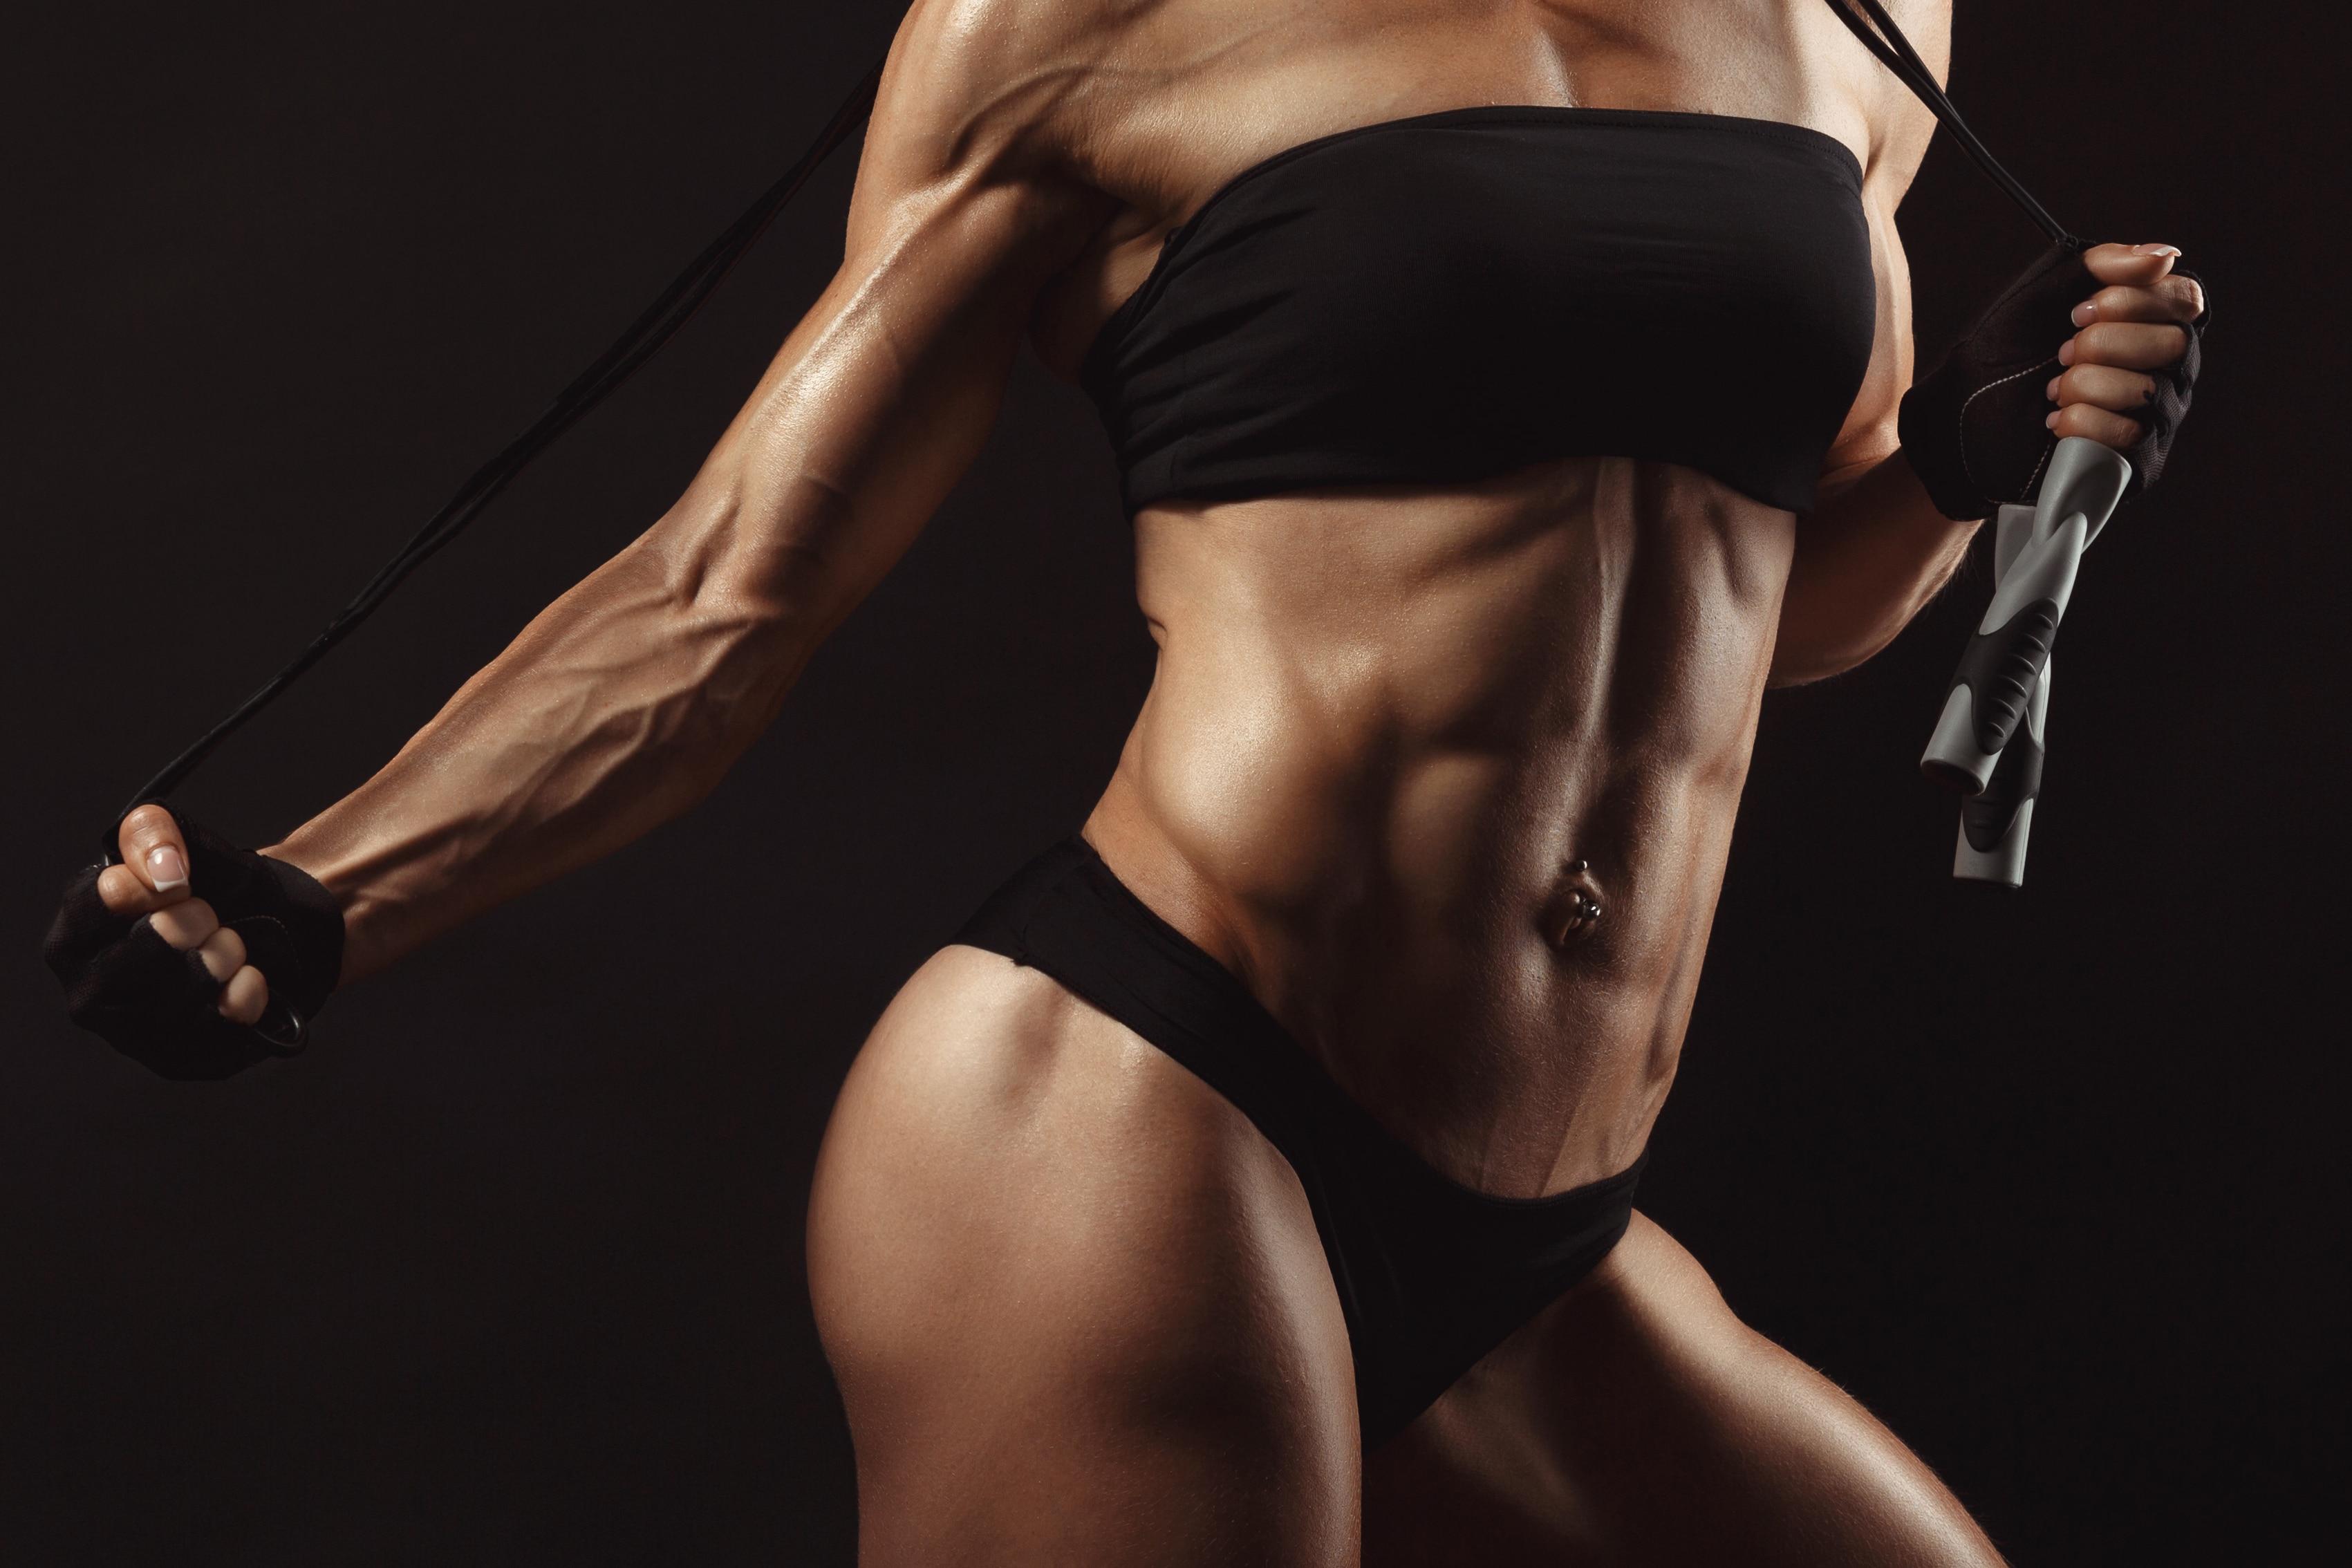 Female Bodybuilding Abs Bodybuilder Muscle Mass Living